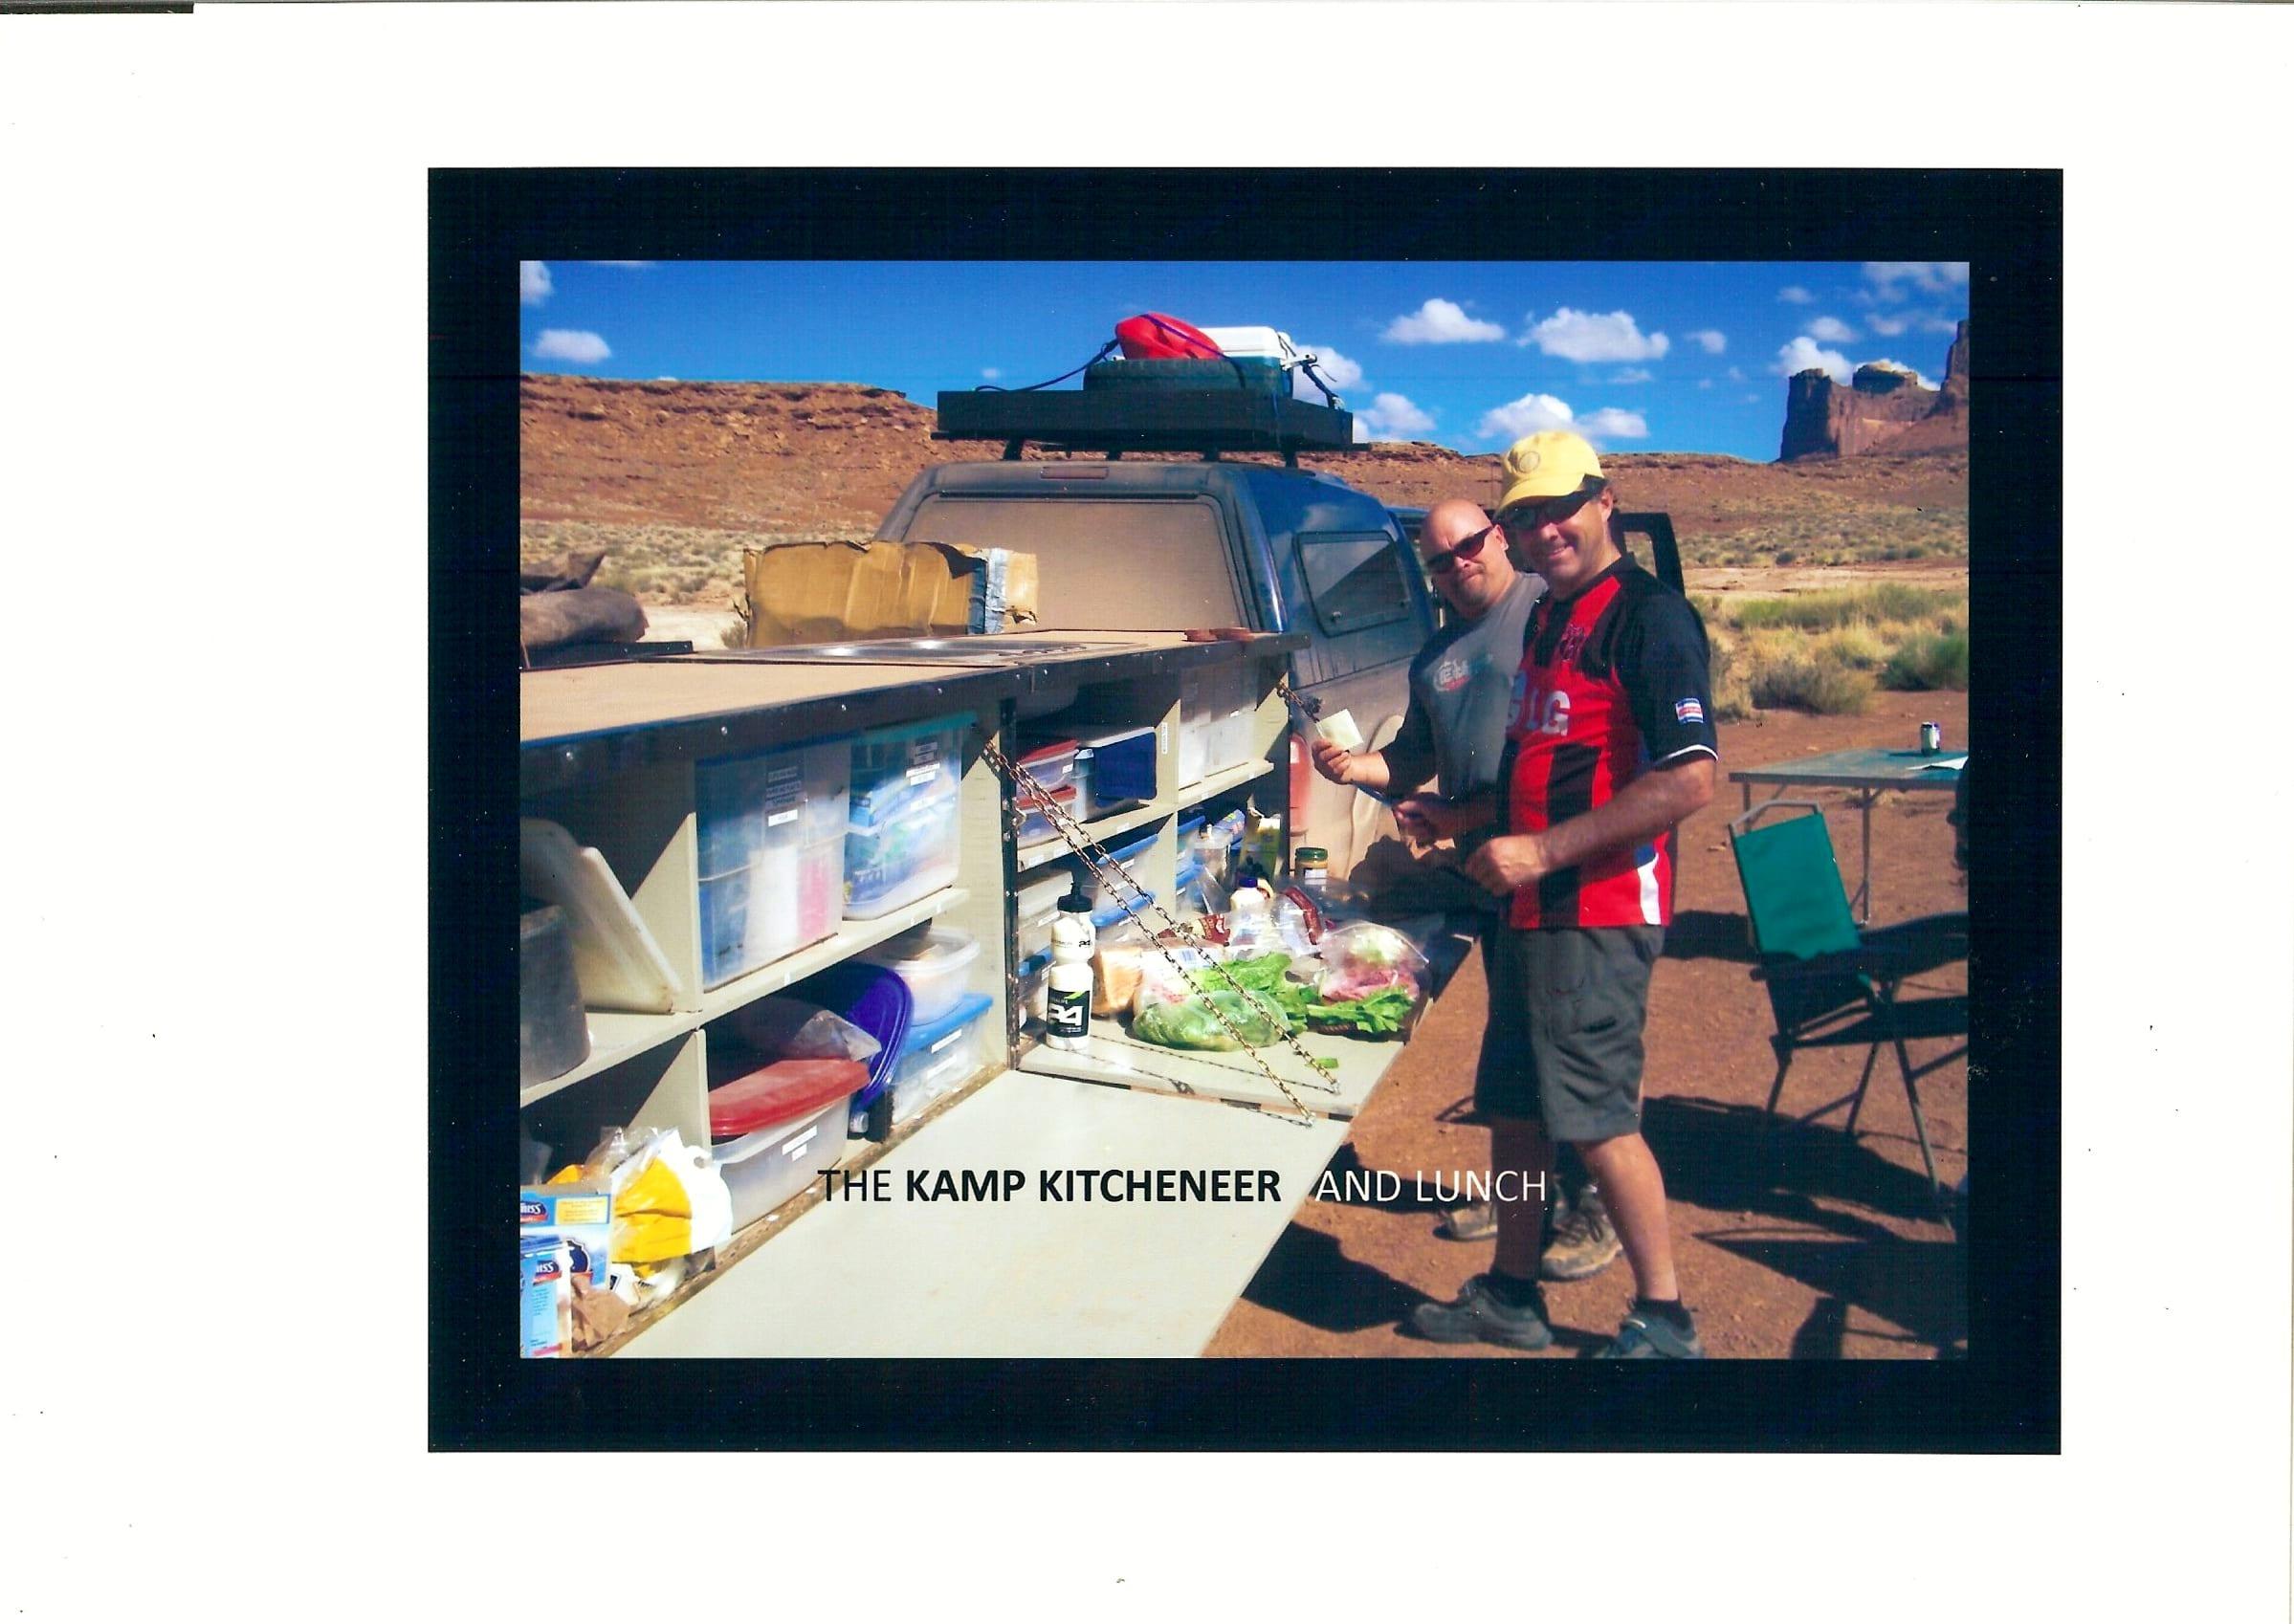 Kamp Kitcheneer And Lunch. Private manufacturer Kamp Kitcheneer Off Road Kitchen Trailer 2016